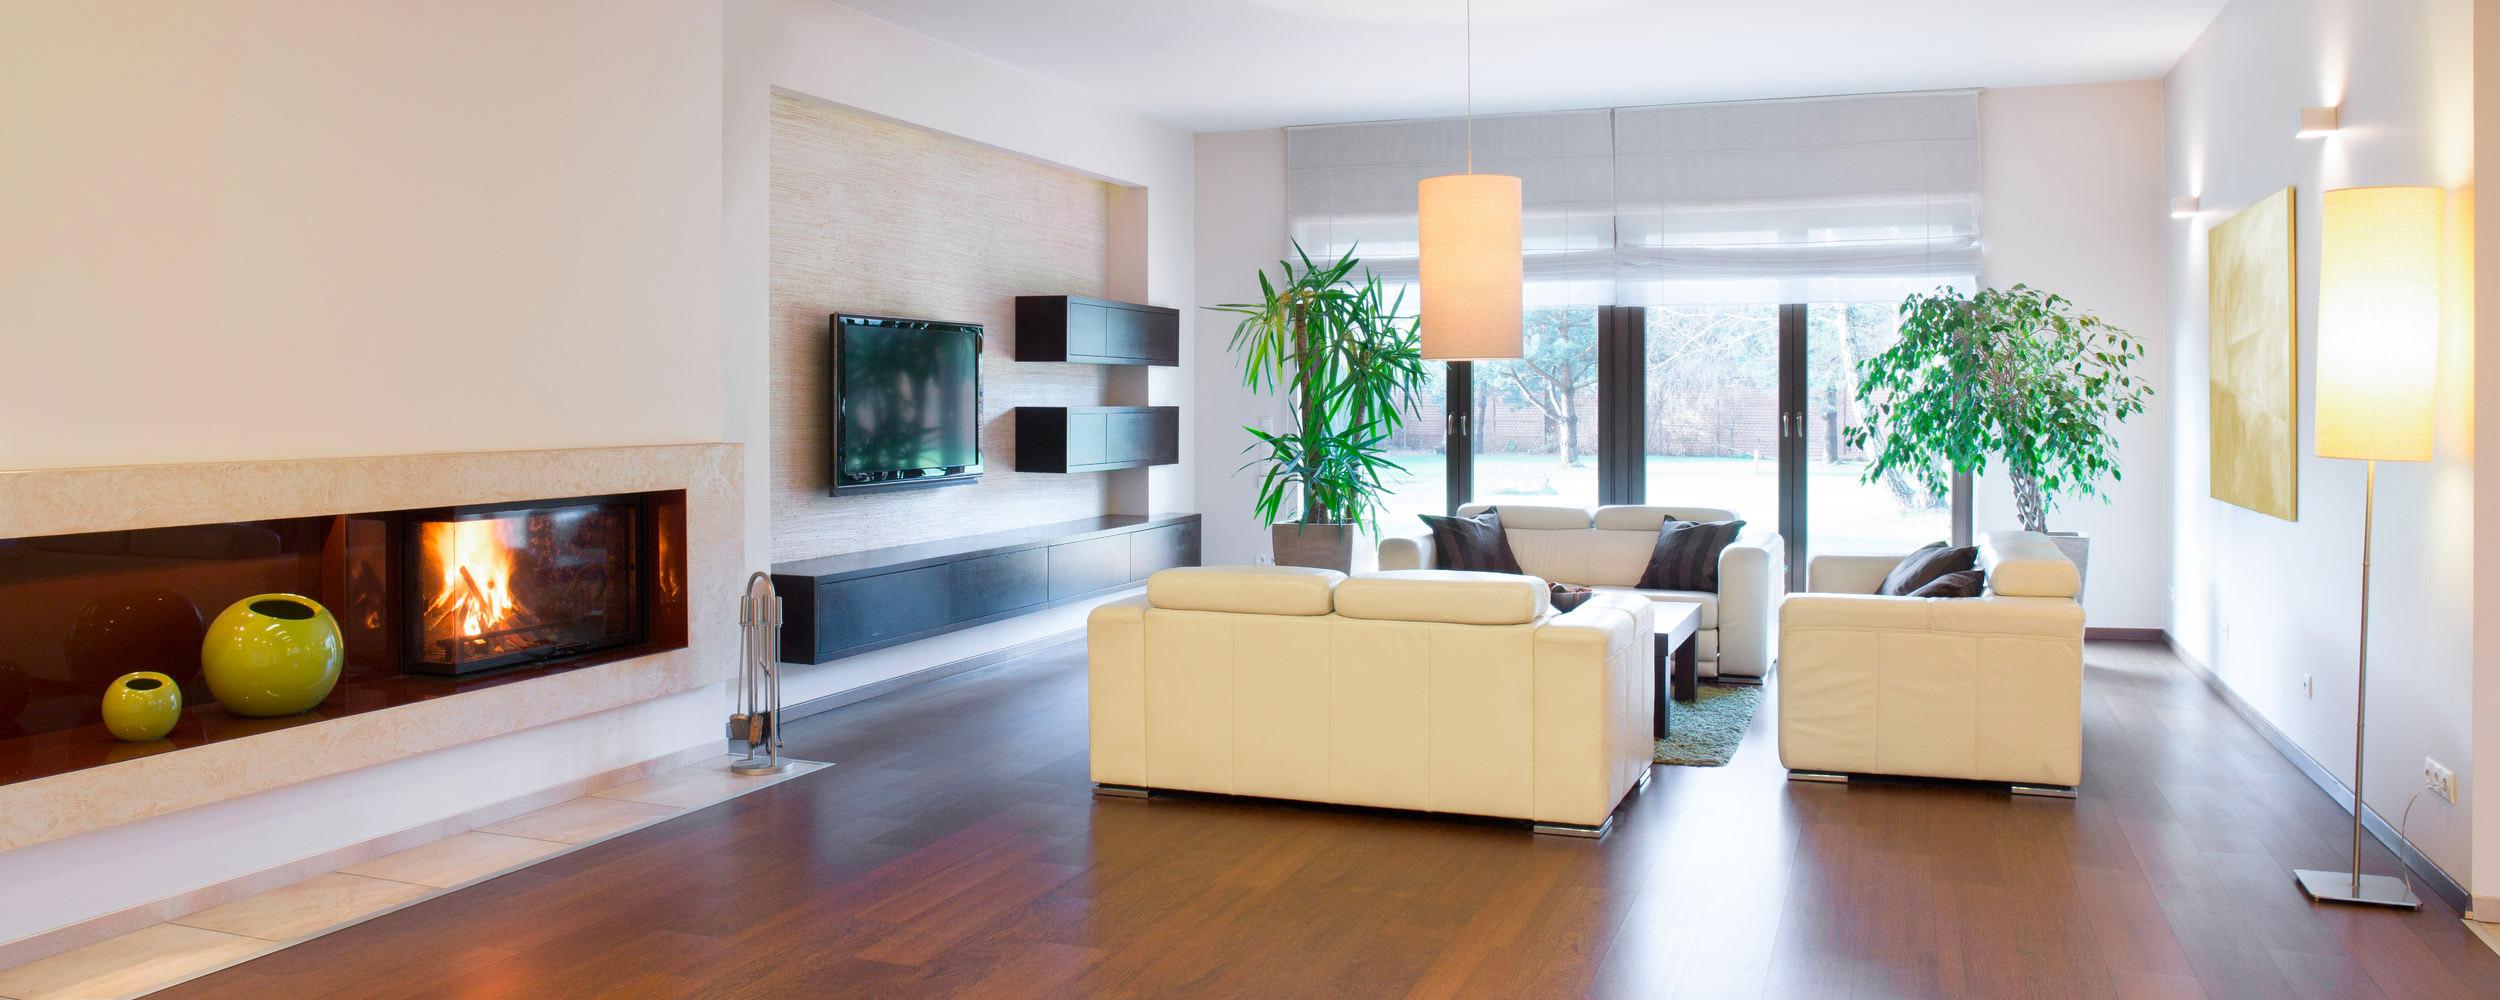 slider-3-peinture-pose-revetement-sol-mural-vitrerie-nettoyage-moquette-versailles